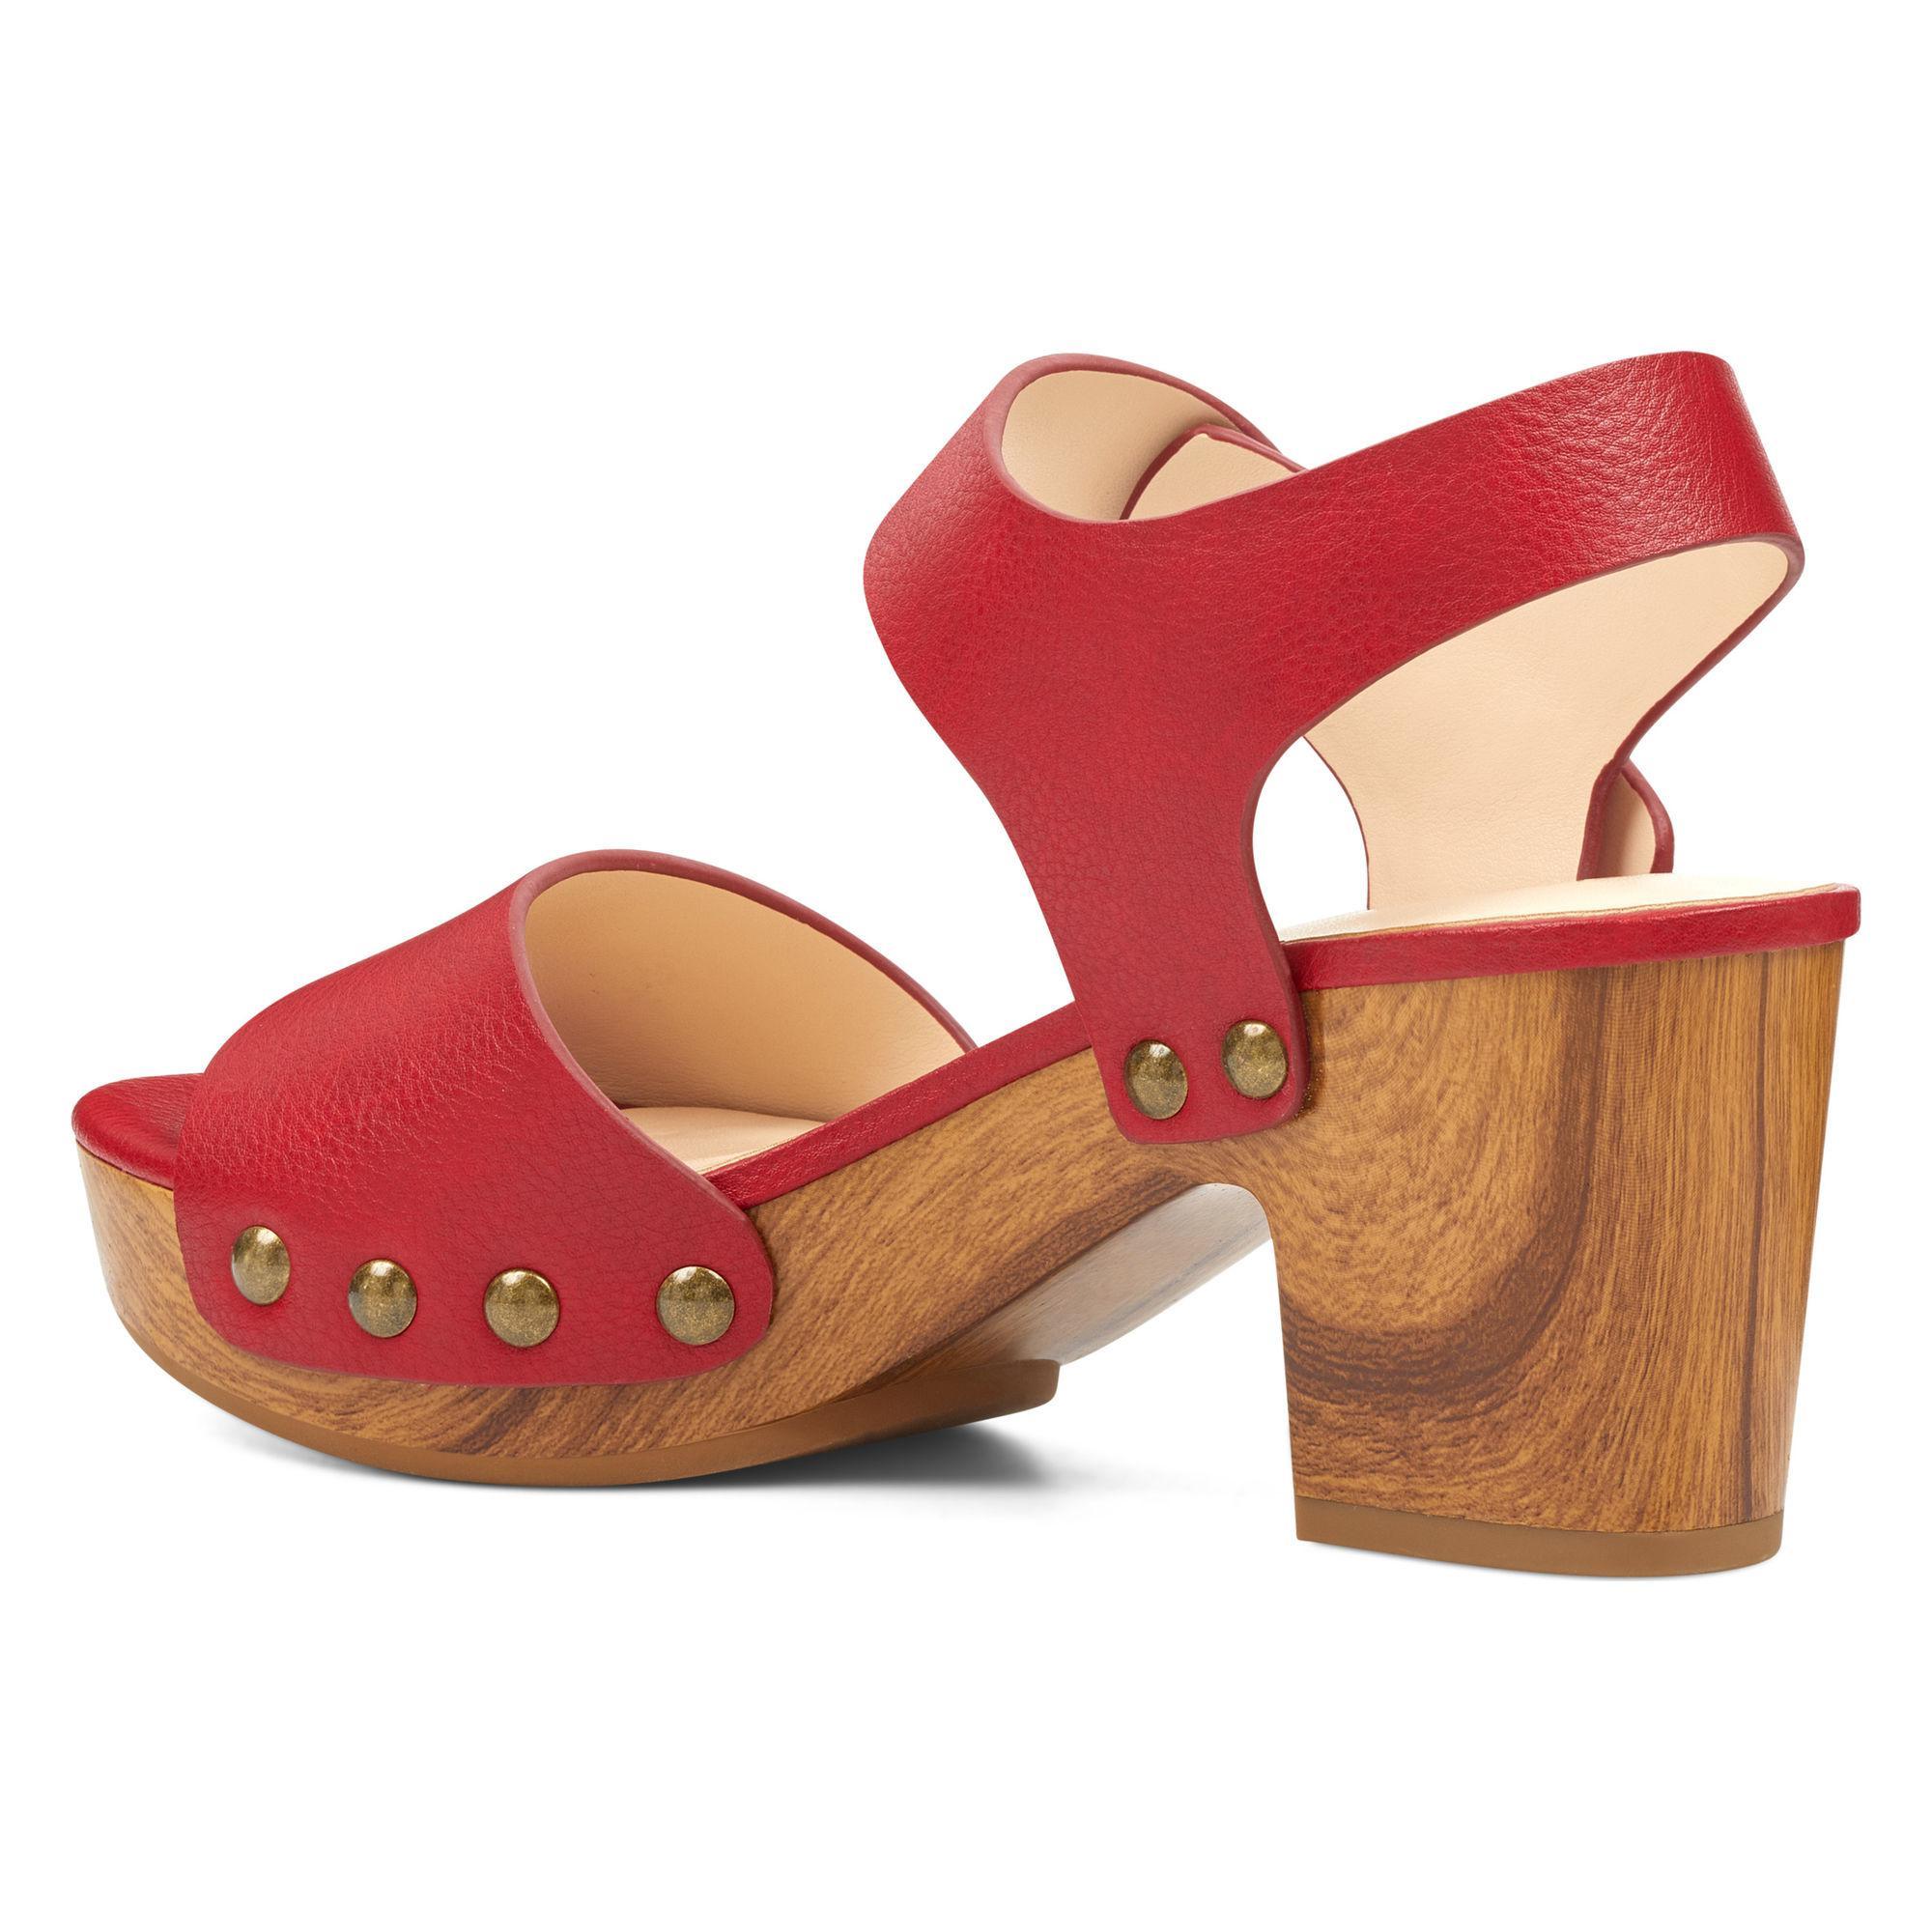 bd3cb76c2e50 Lyst - Nine West Cecilia Platform Sandals in Red